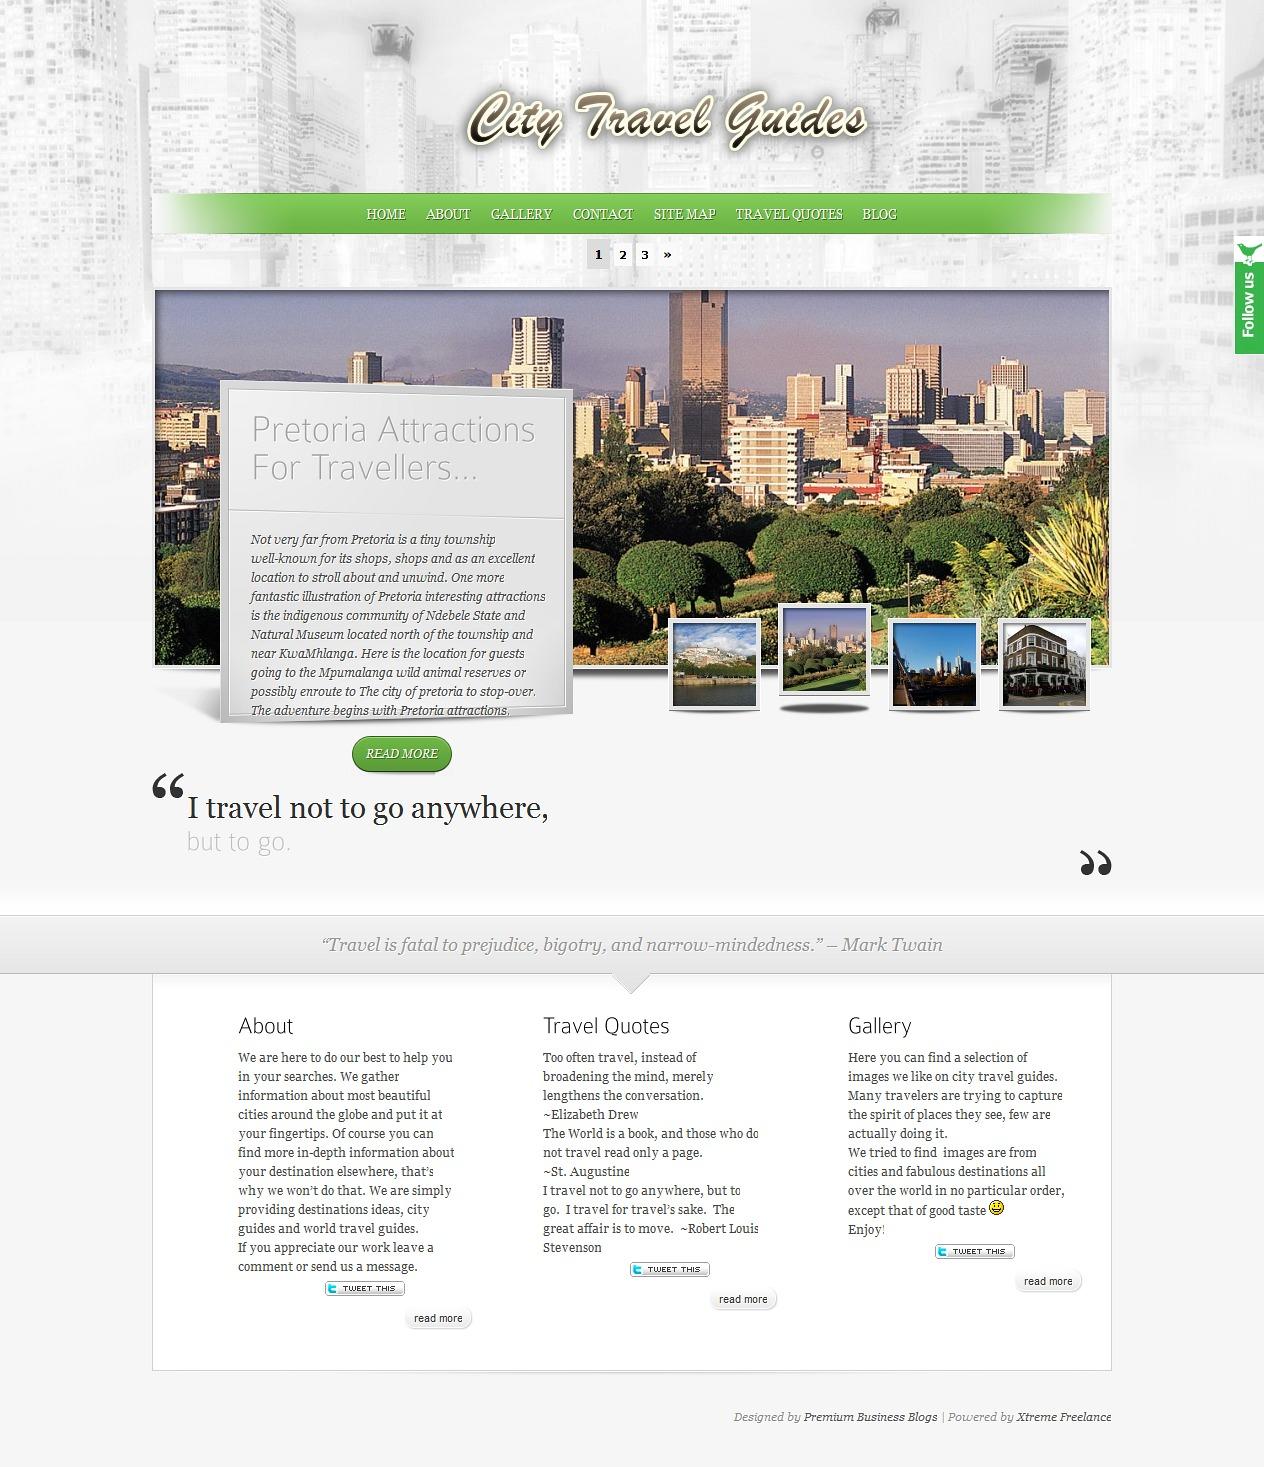 citytravelguides.info